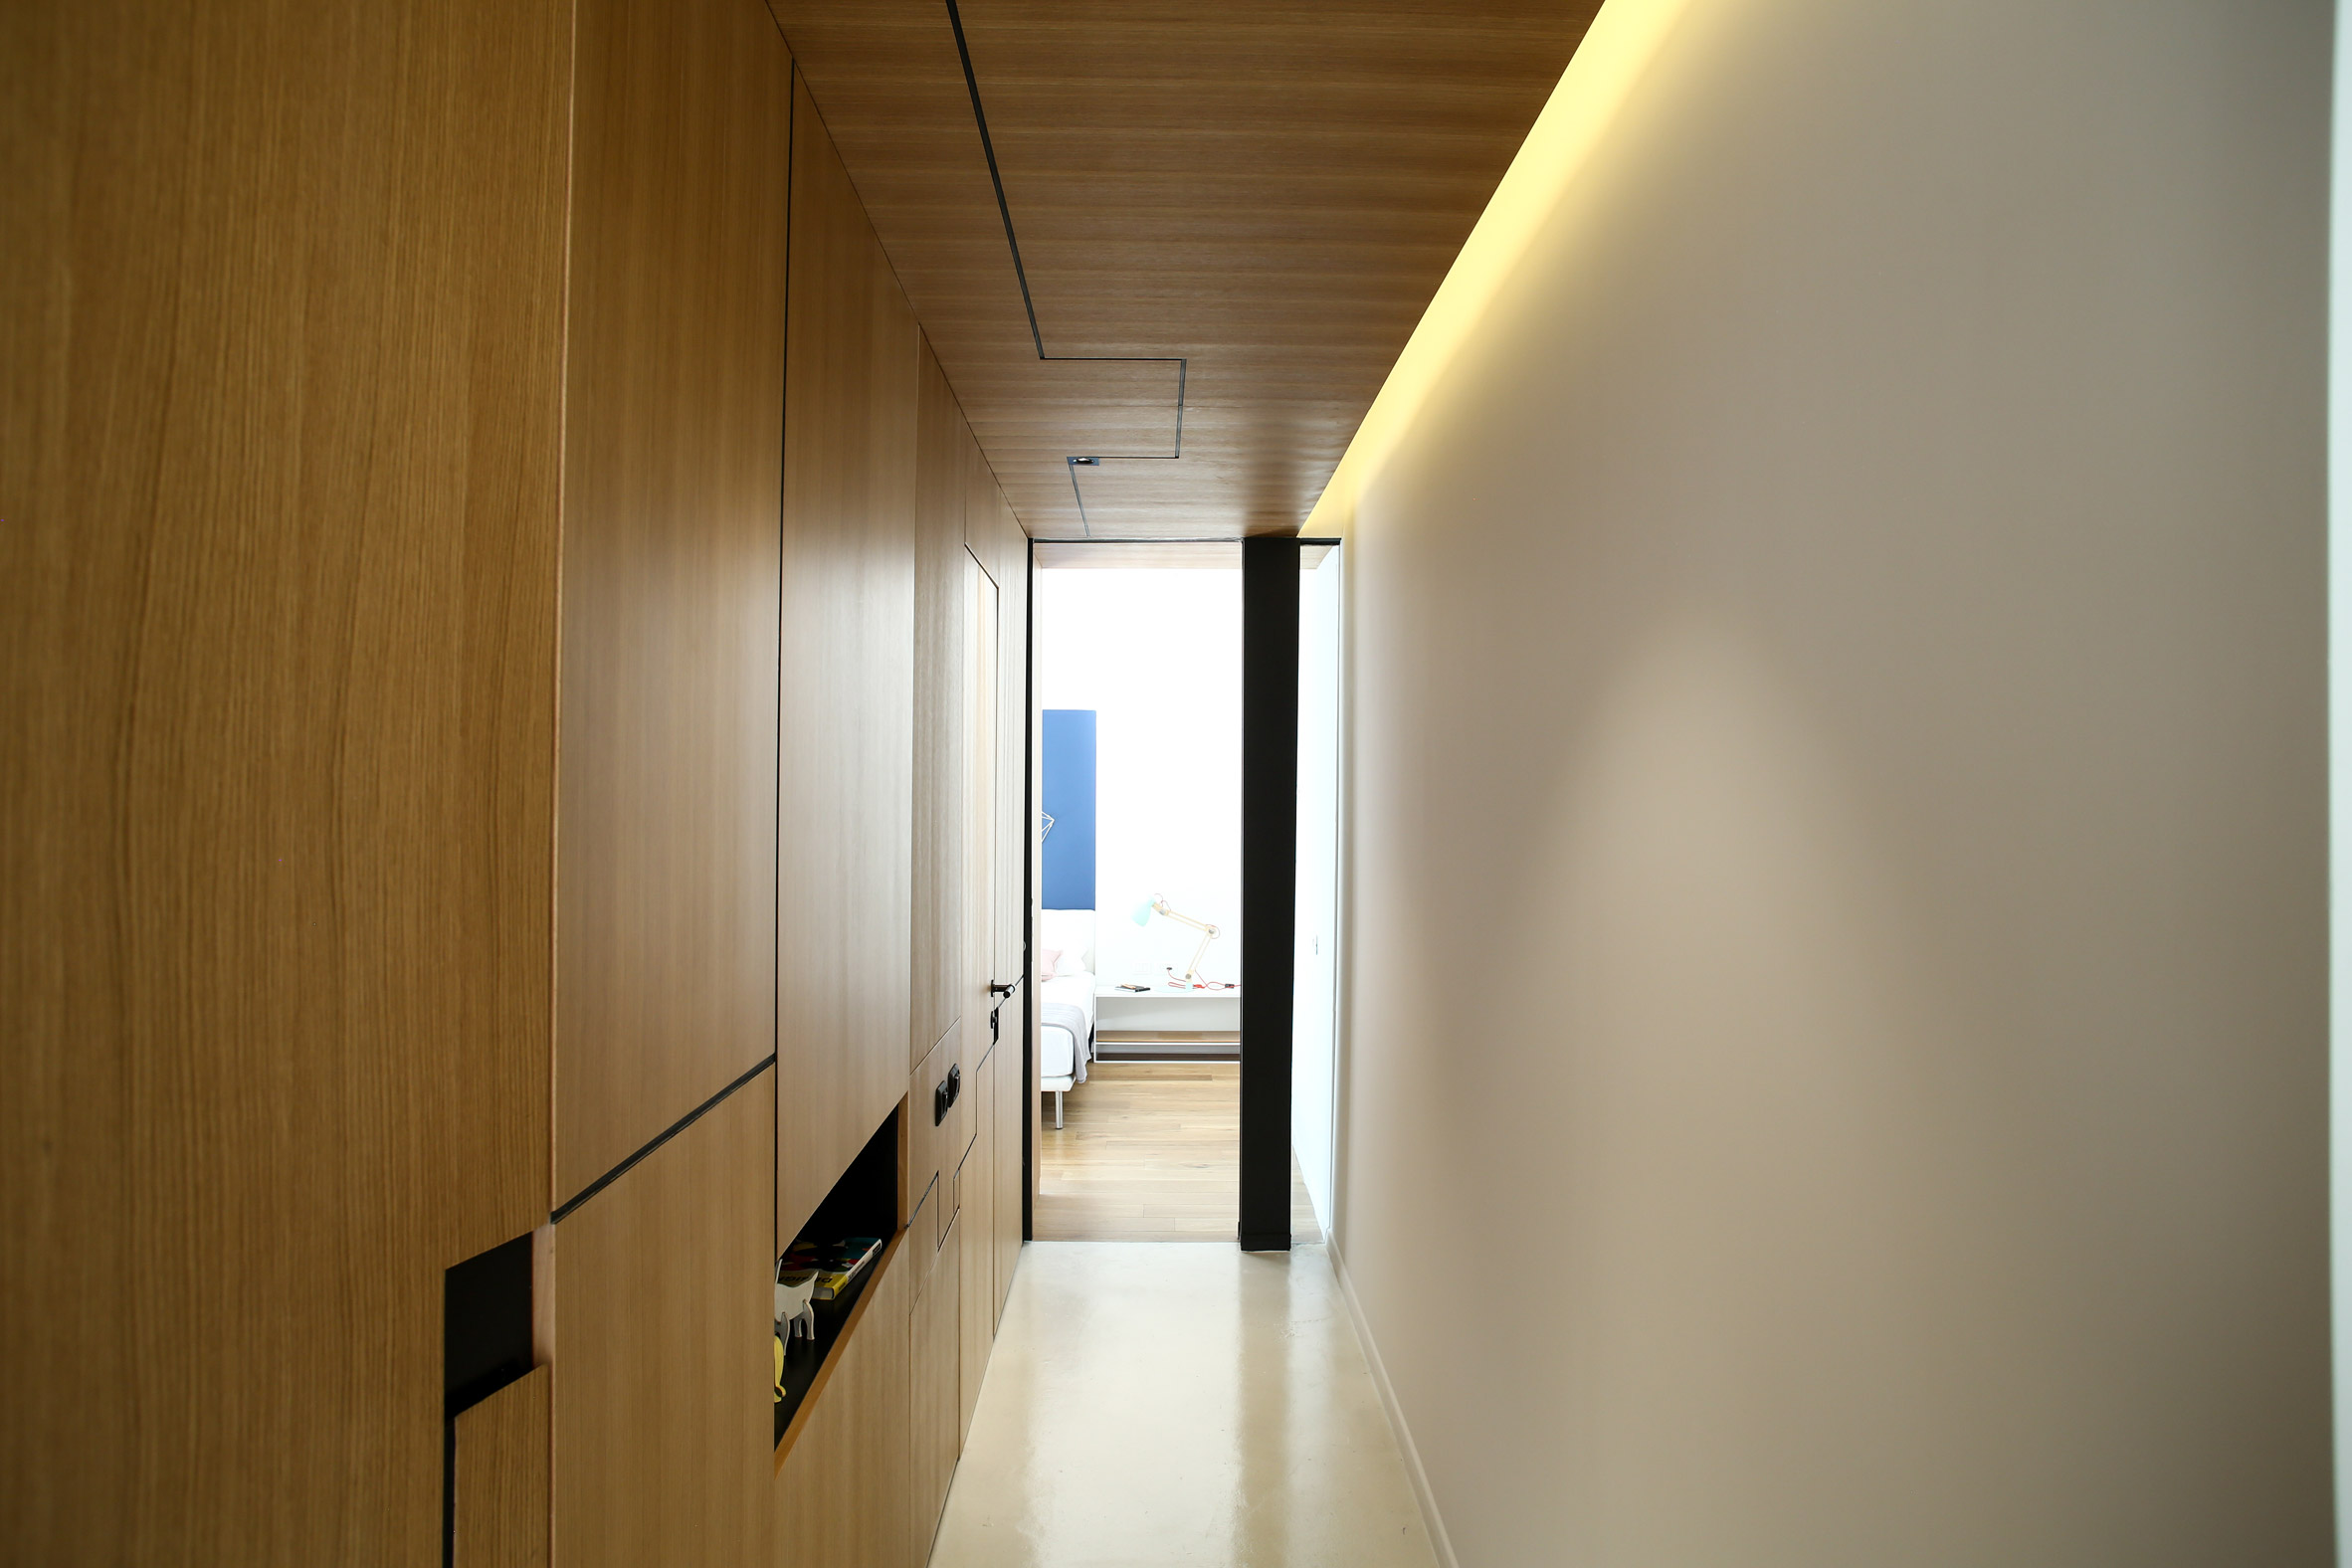 weisel-apartment-tel-aviv-israel-dori-design-studio-renovation_dezeen_2364_col_18